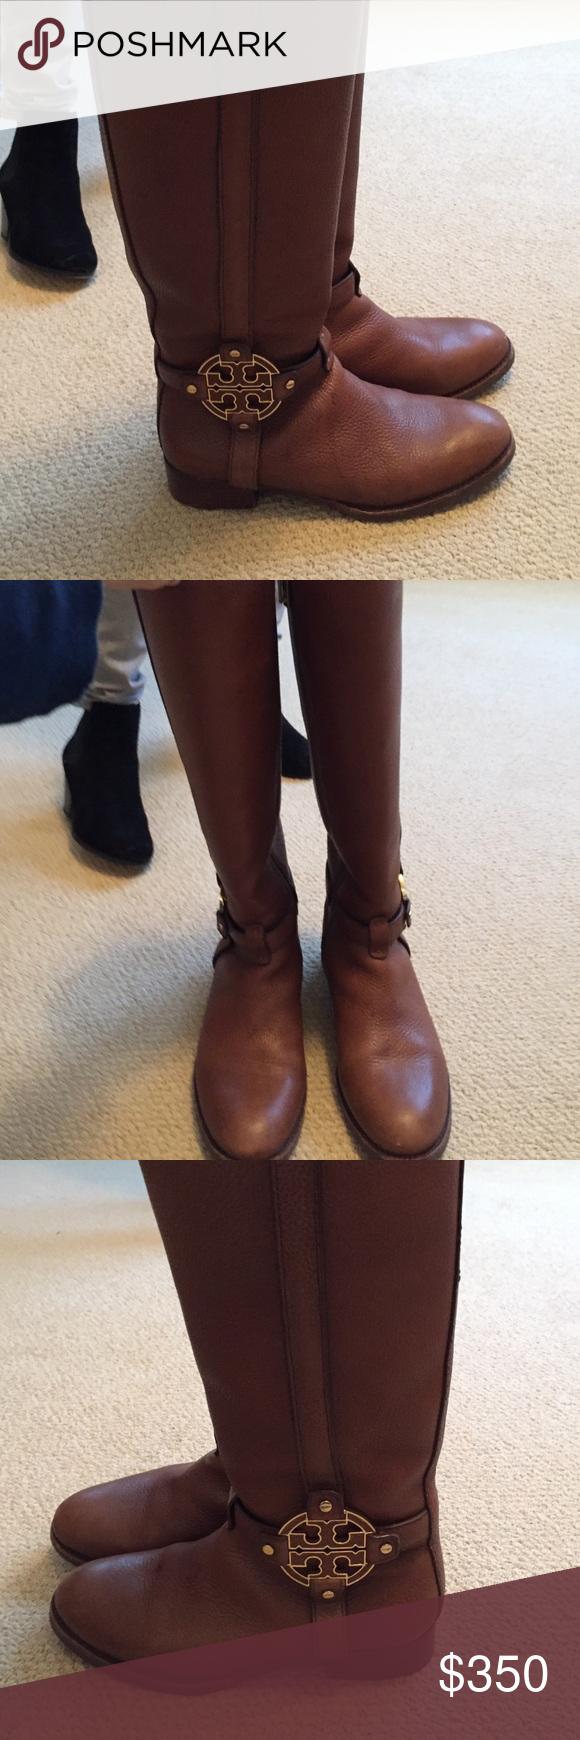 Tory Burch brown riding boots Brown Tory Burch riding boots size 7 Tory Burch Shoes Heeled Boots